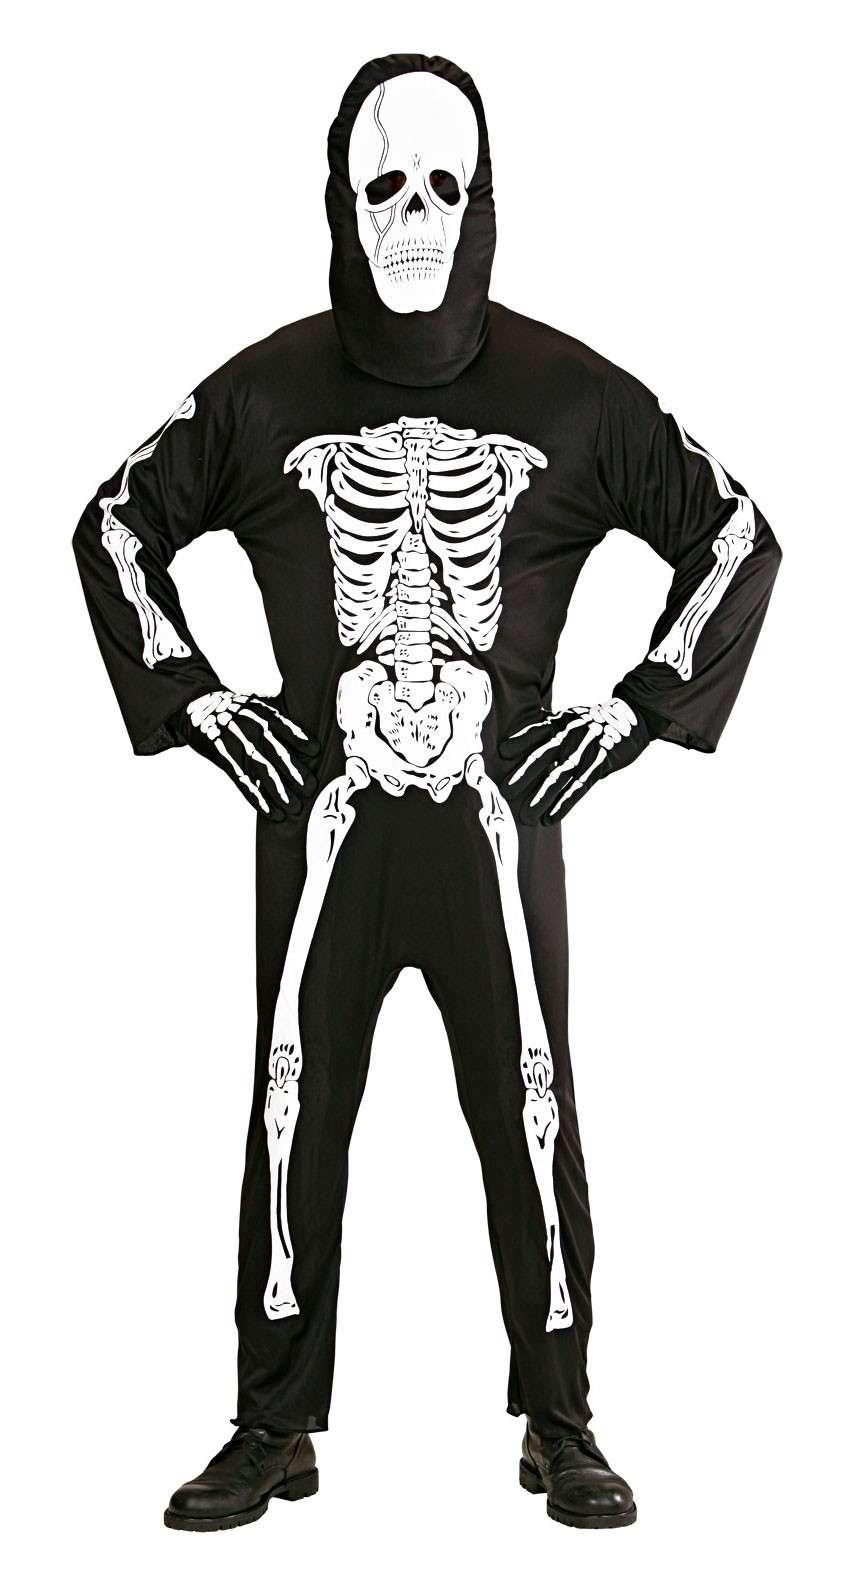 schwarzer skelettanzug fuer herren 168PvXl0aI3ZBp 1280x1280 2x